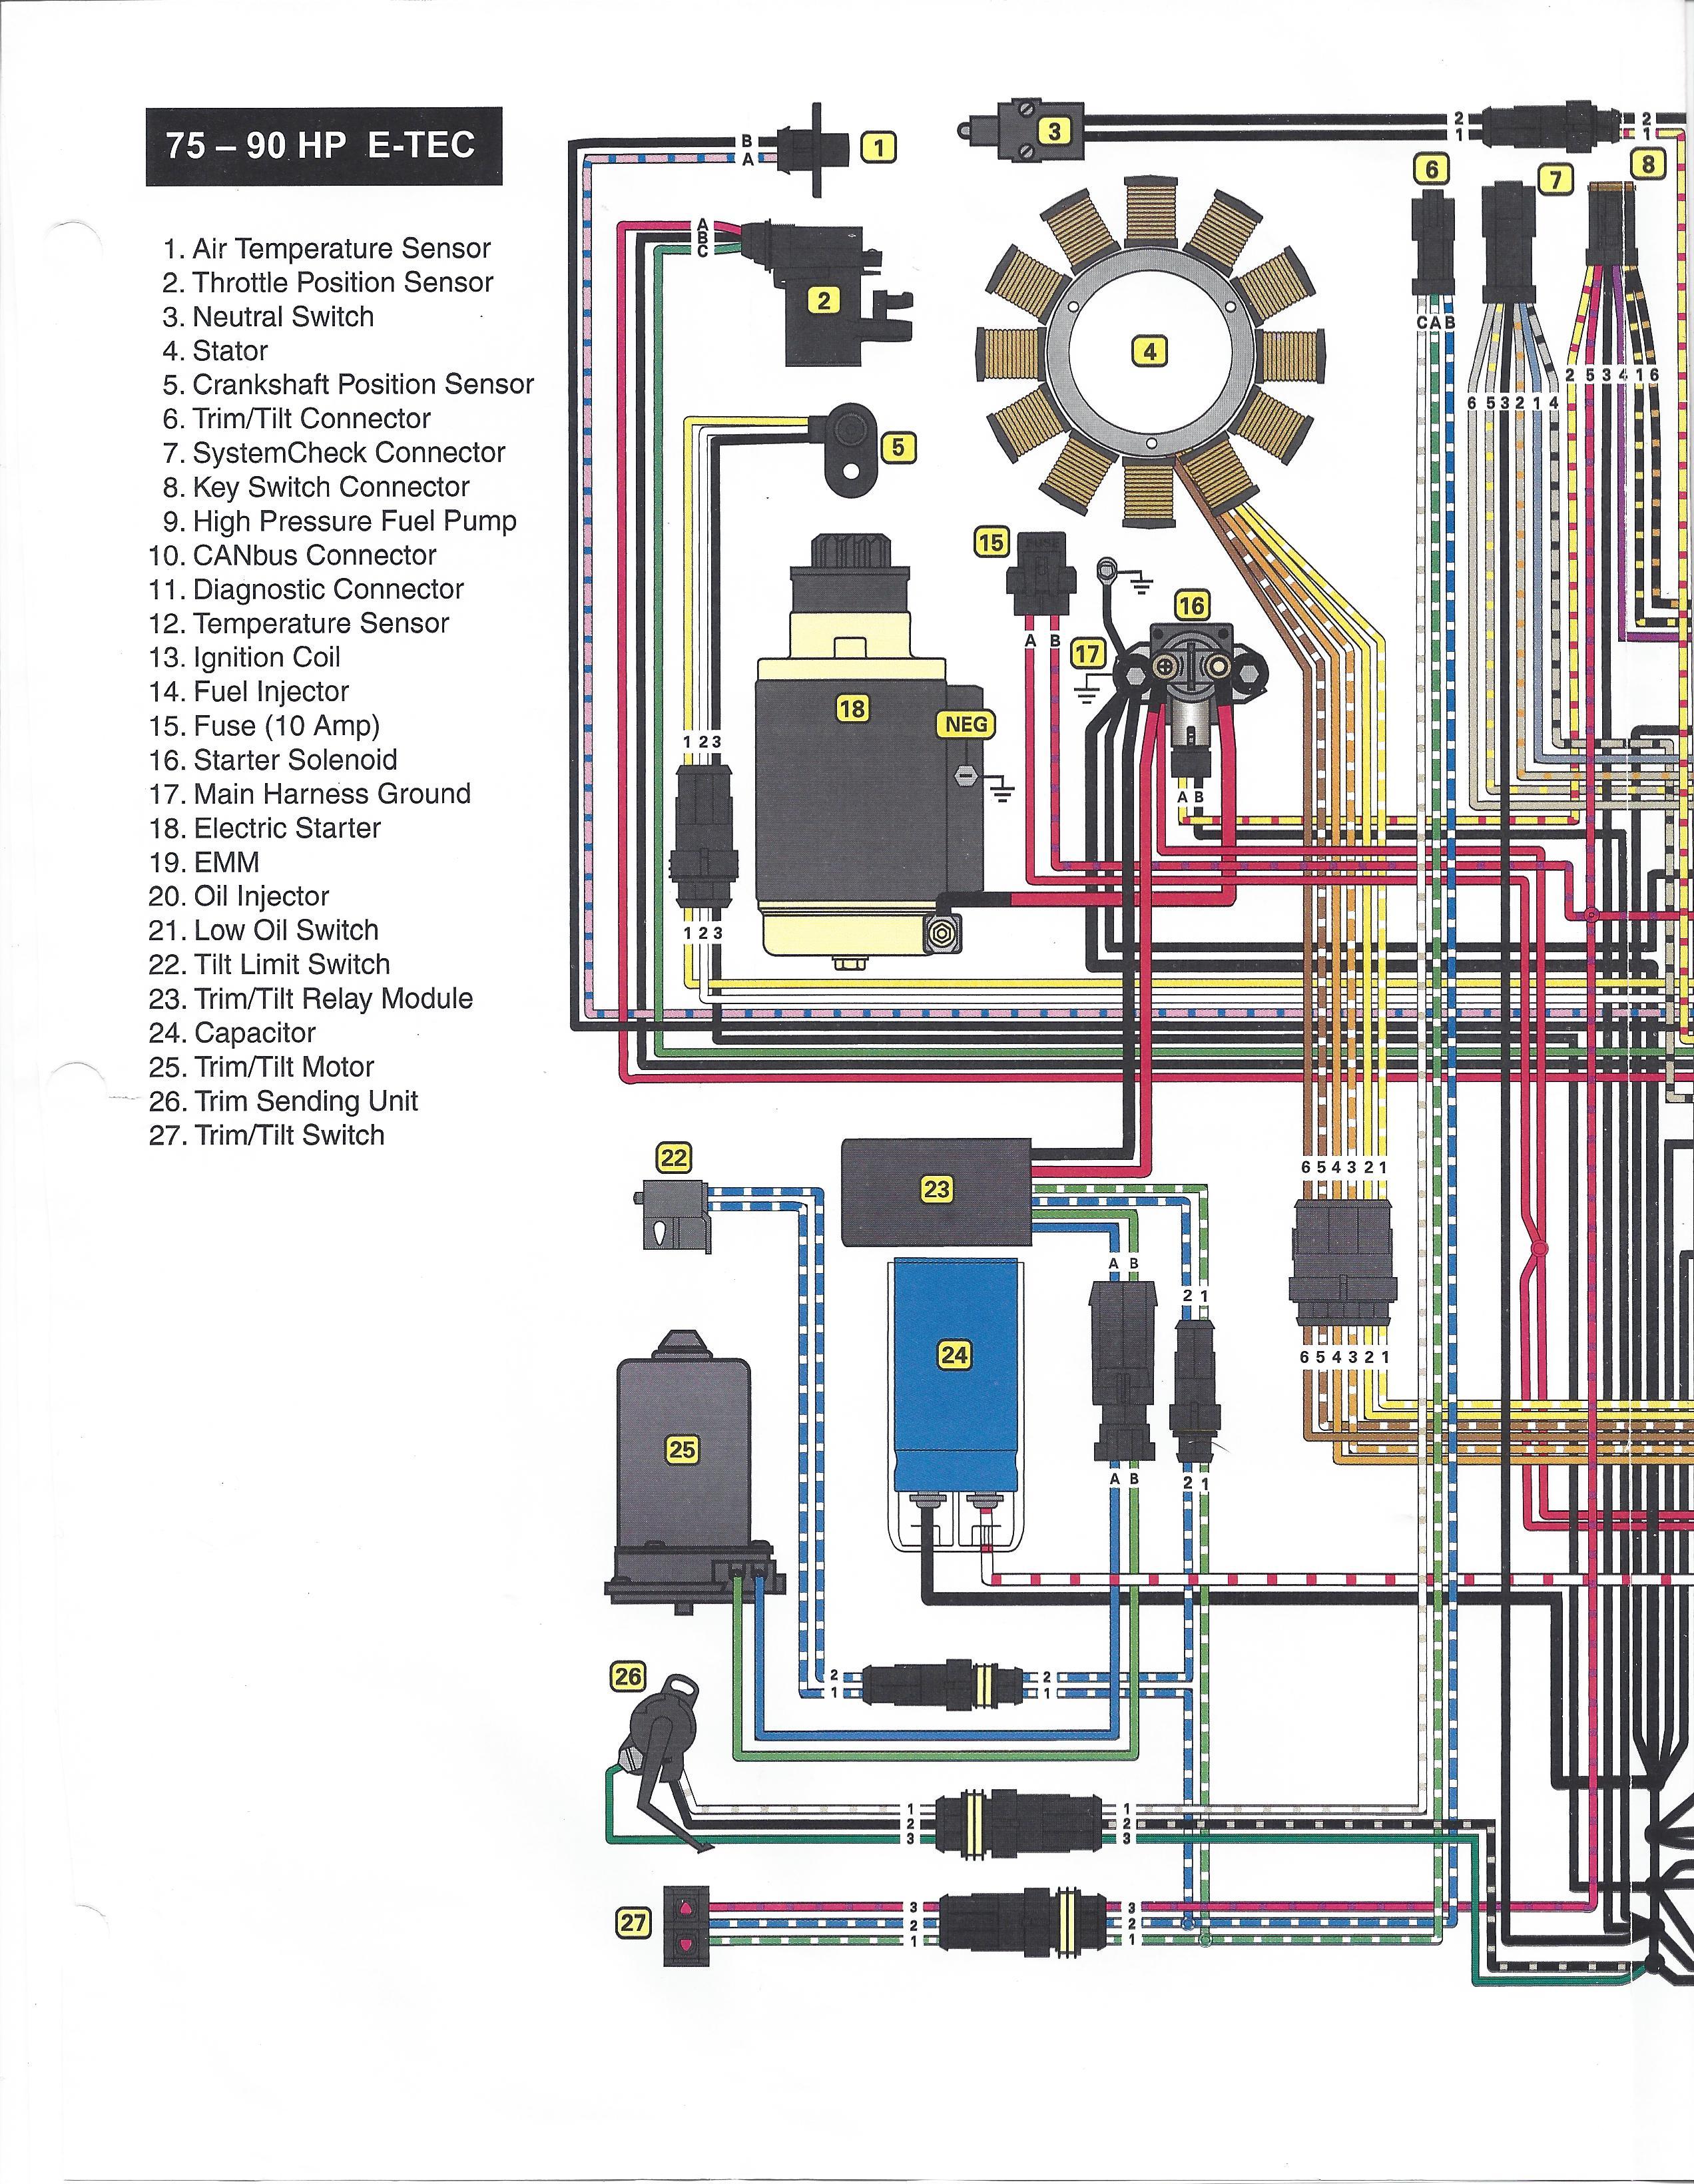 Evinrude 250 Wiring Diagram - Wiring Block Diagram - Evinrude Wiring Diagram Outboards